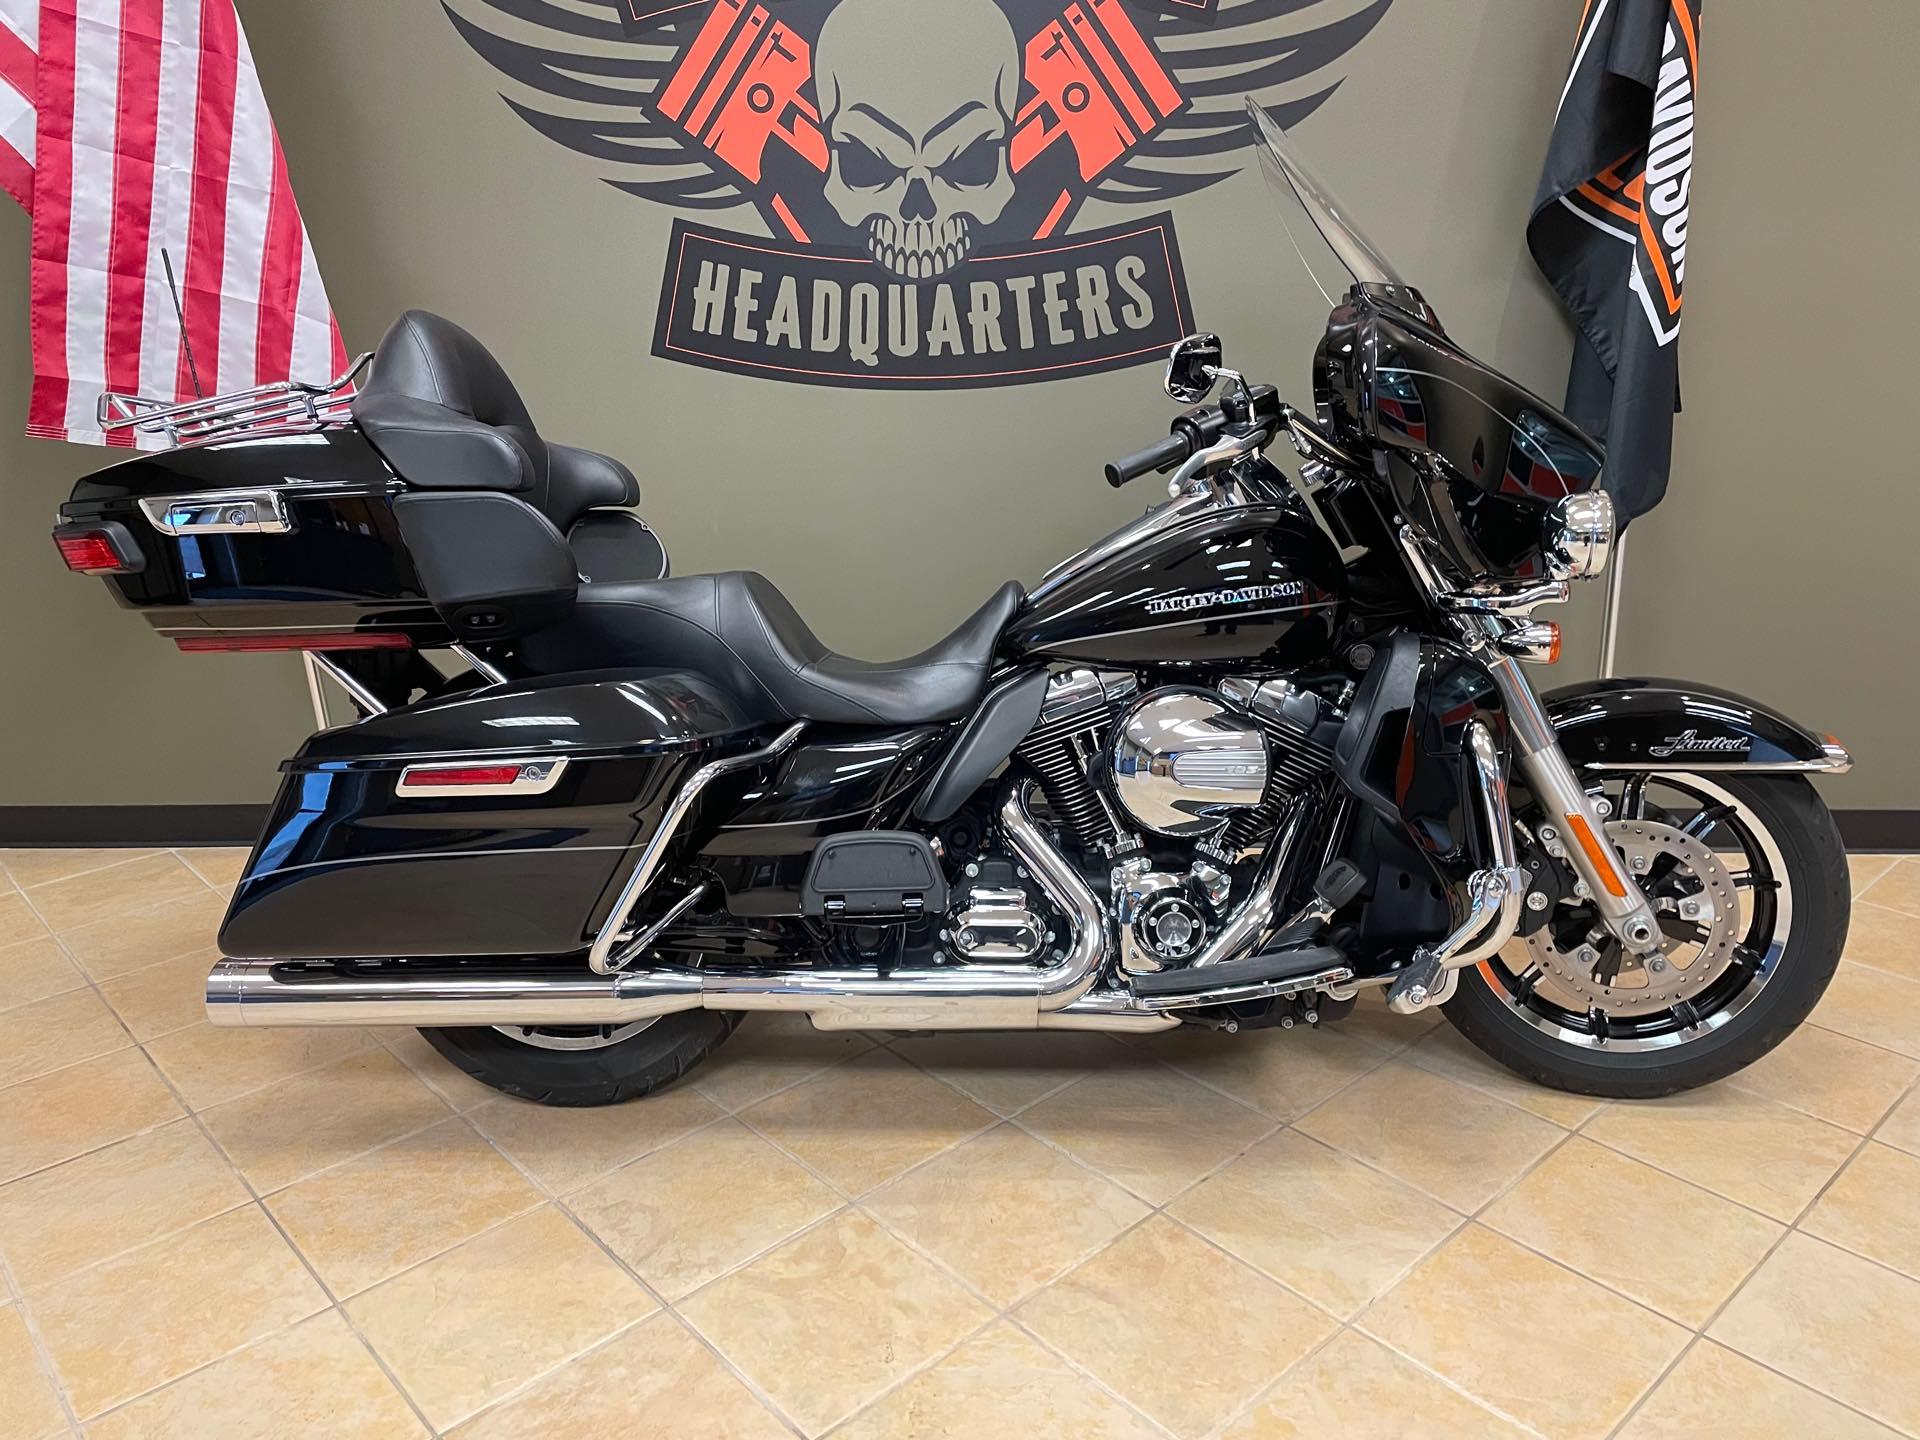 2015 Harley-Davidson Electra Glide Ultra Limited Low at Loess Hills Harley-Davidson